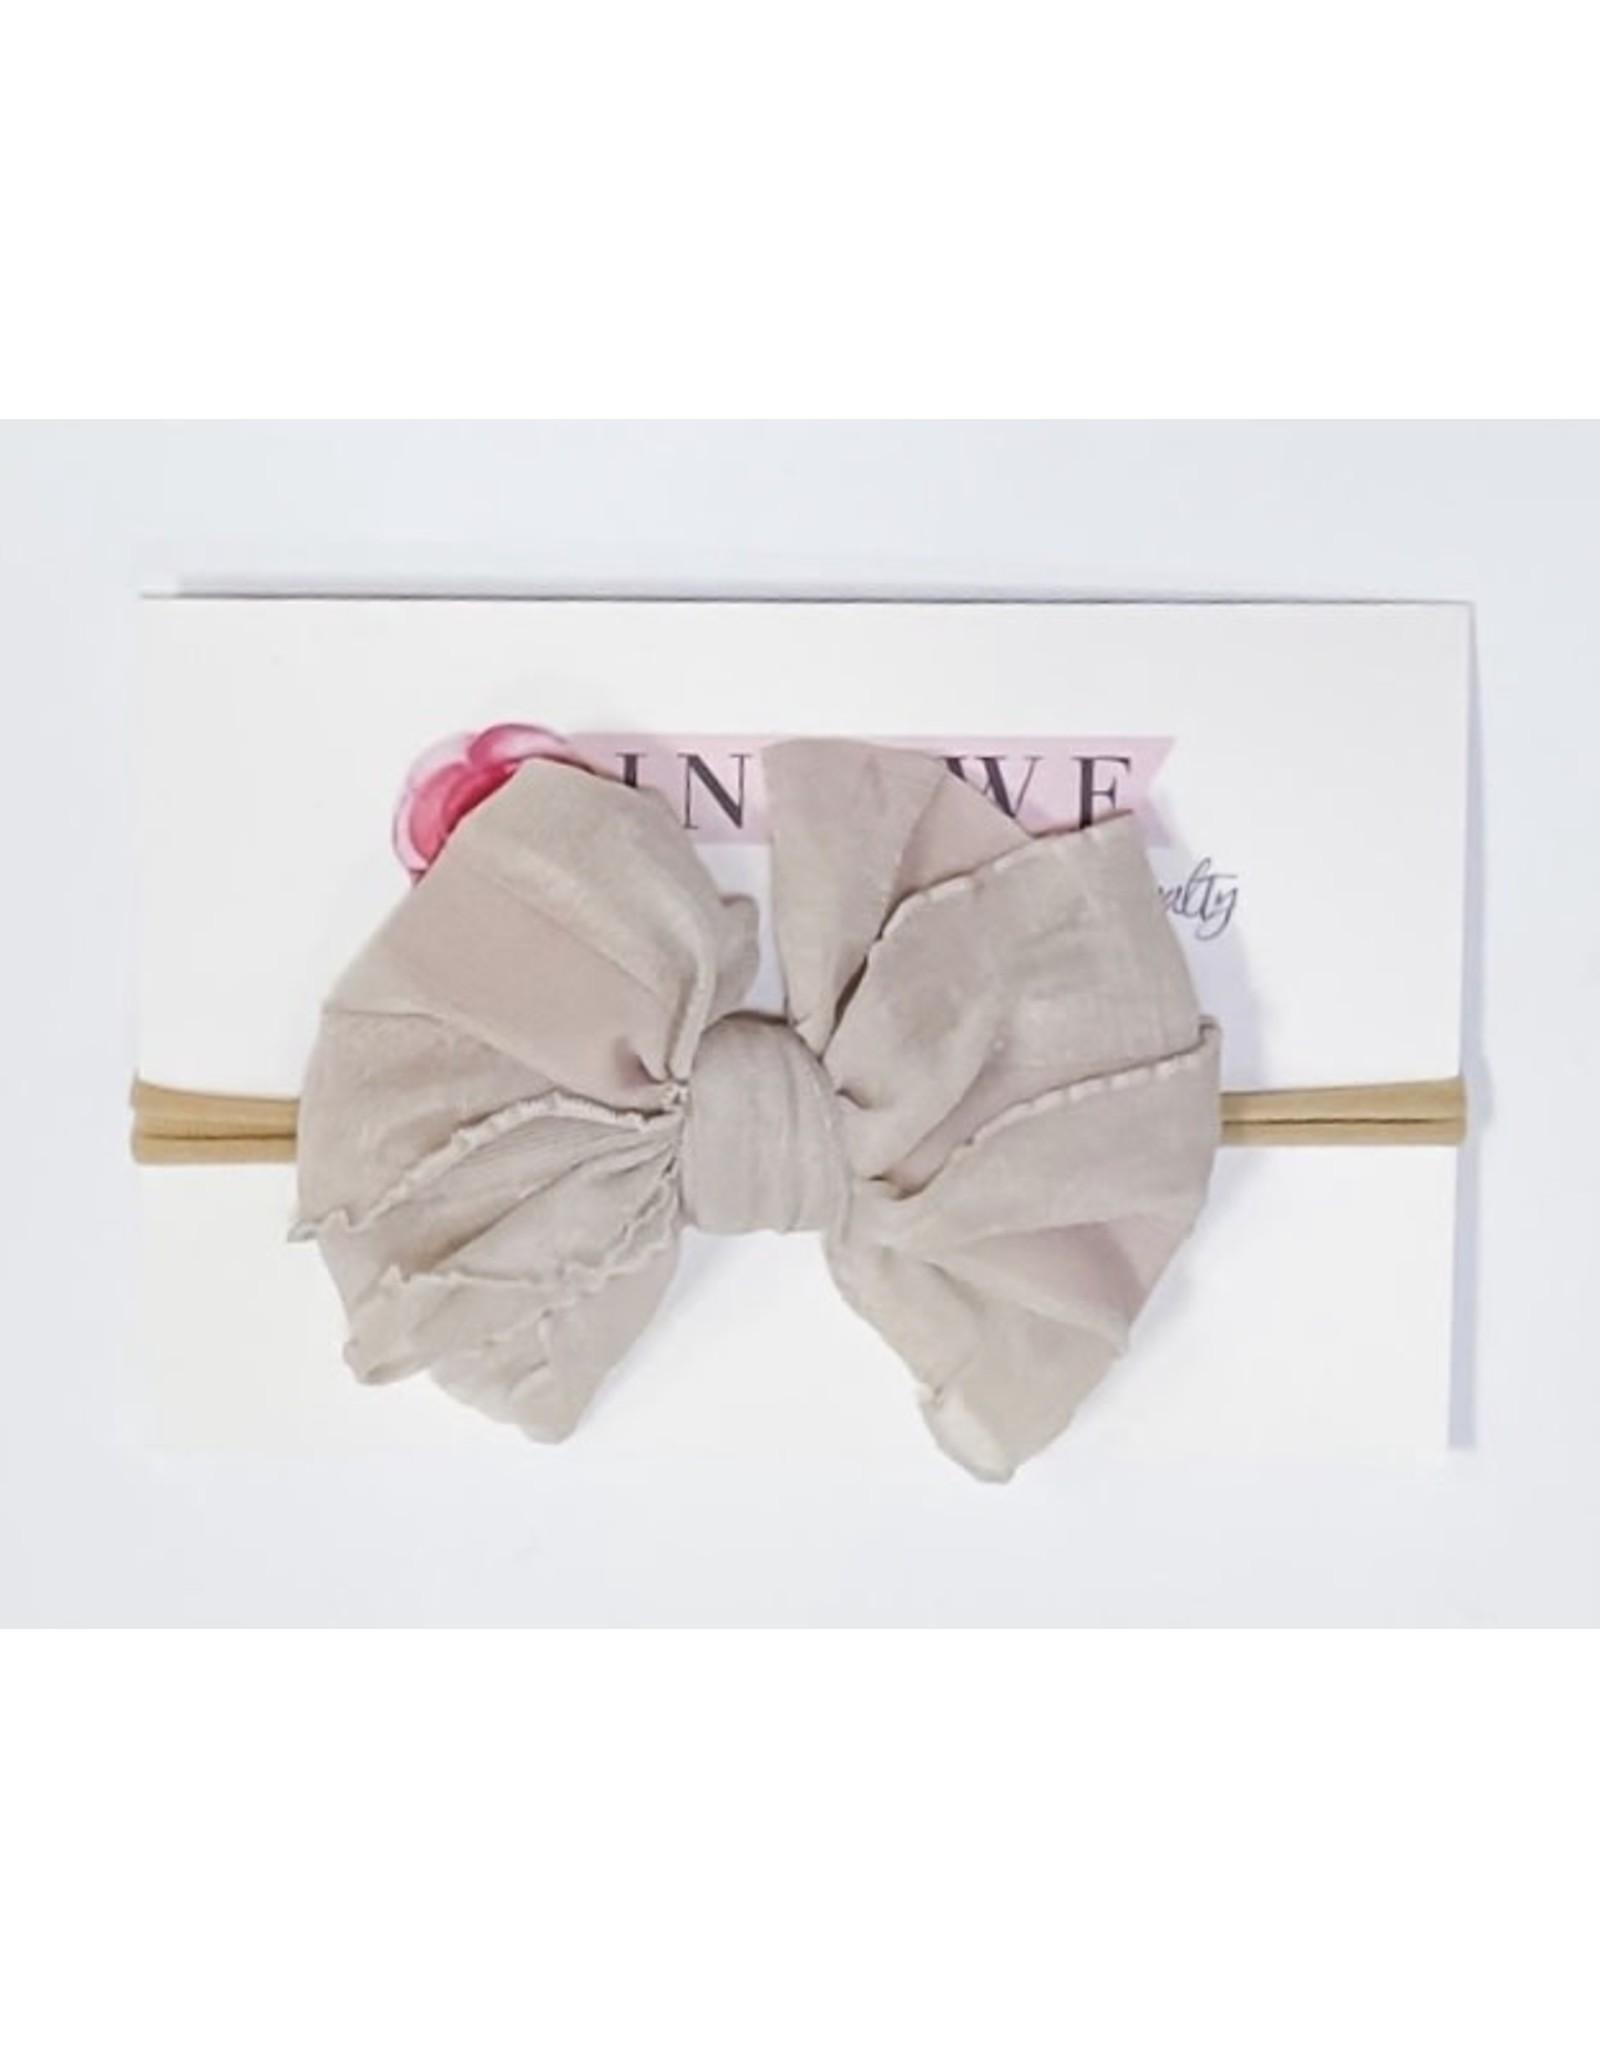 In Awe - Champagne Mini Ruffle Bow on Nylon Headband